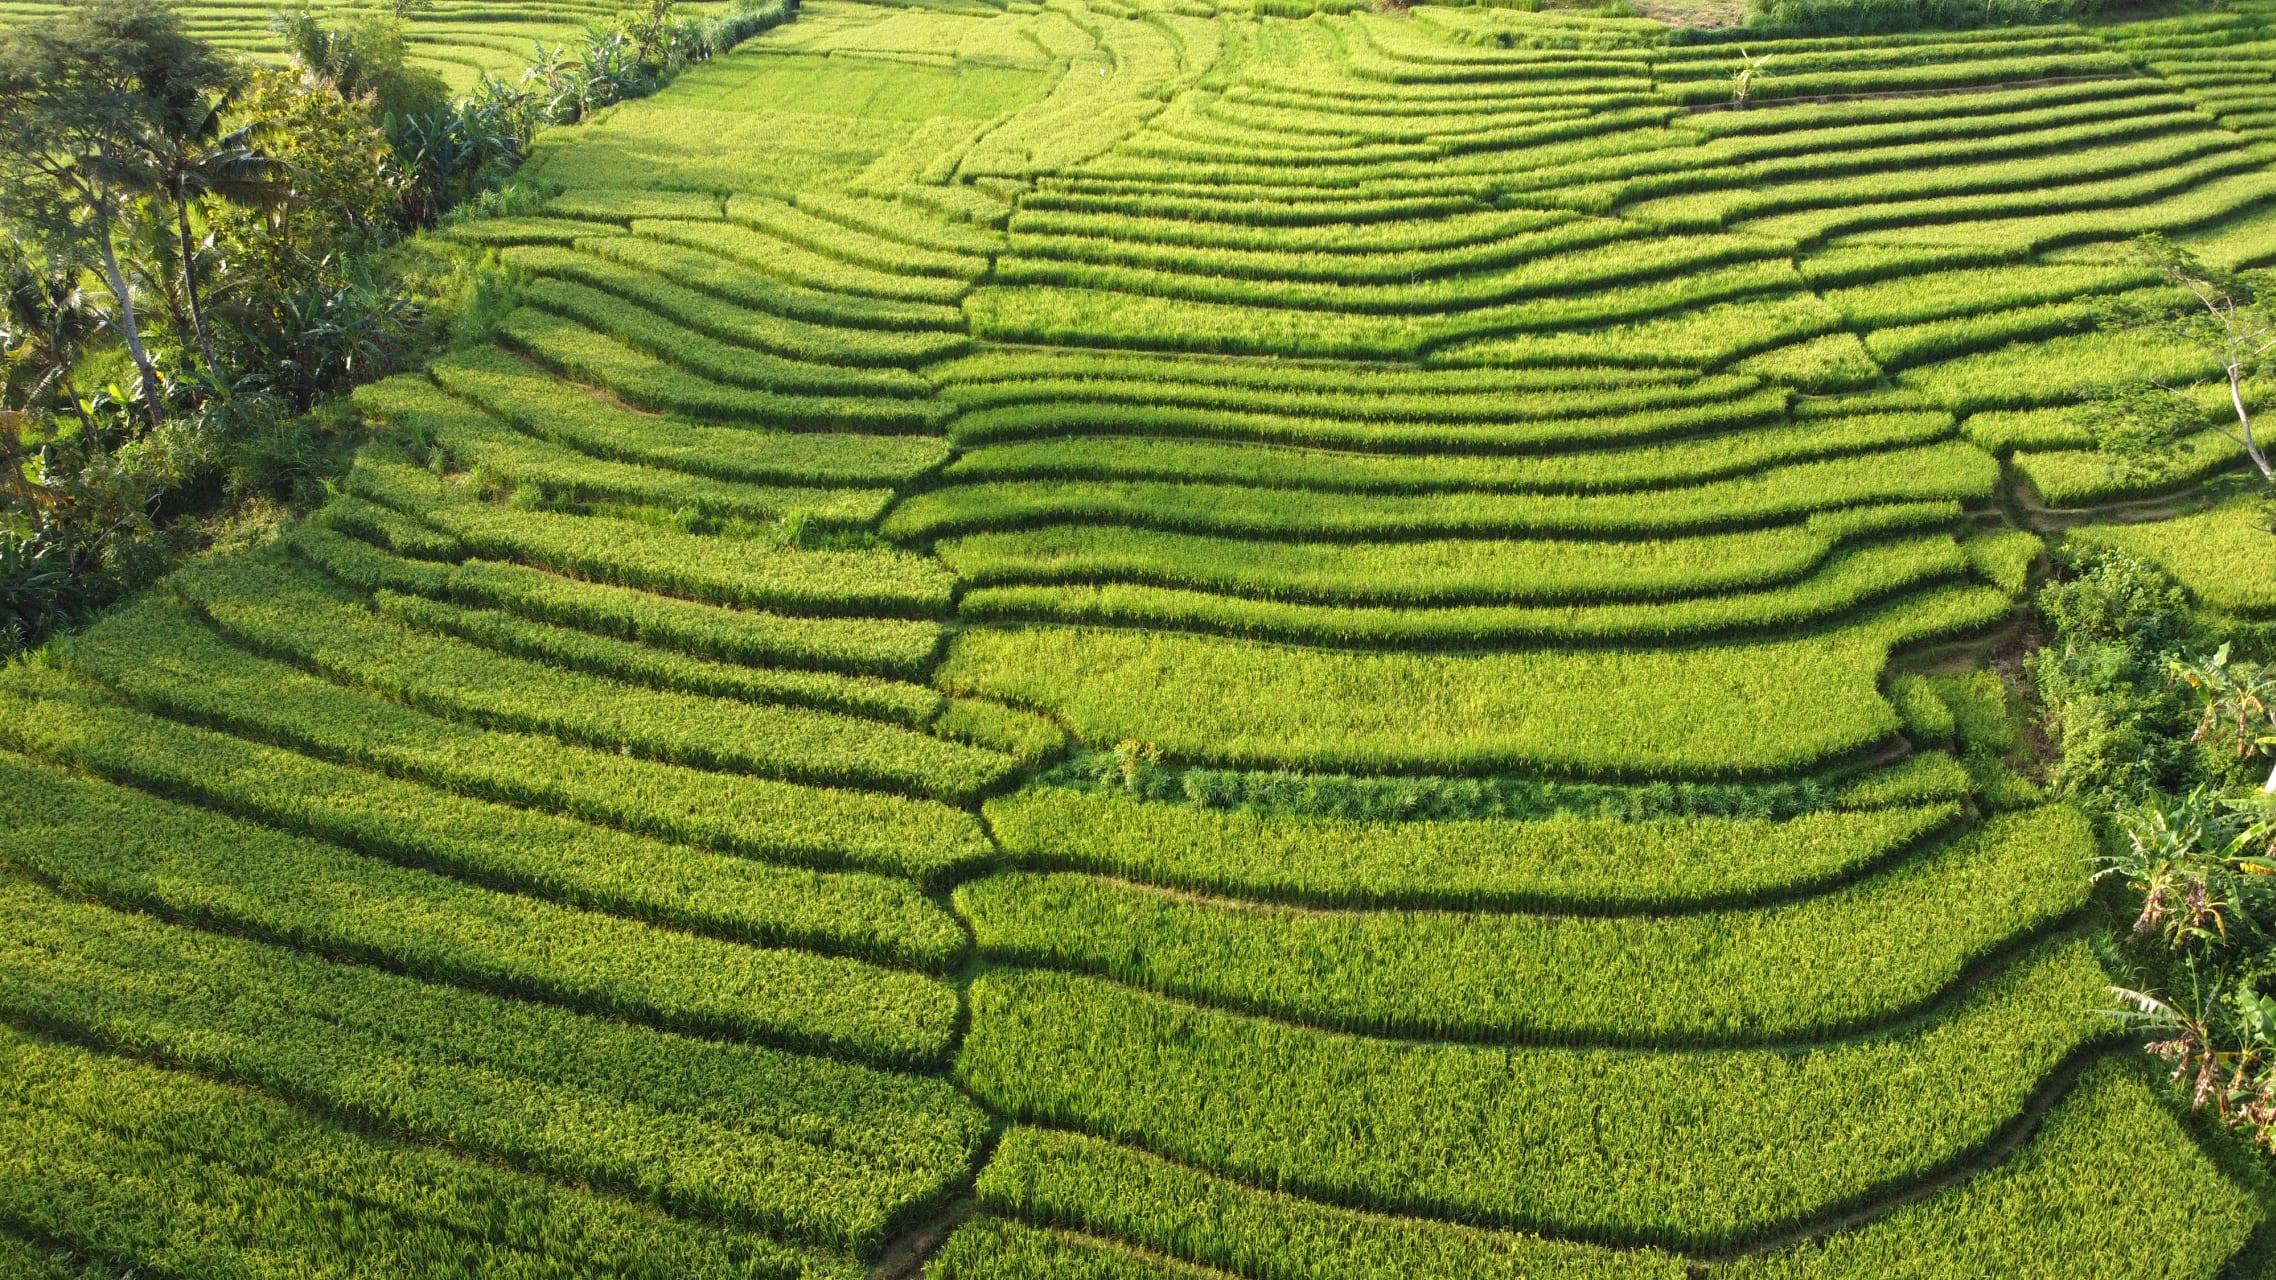 Yogyakarta - Village Life and Local Farming in Yogyakarta